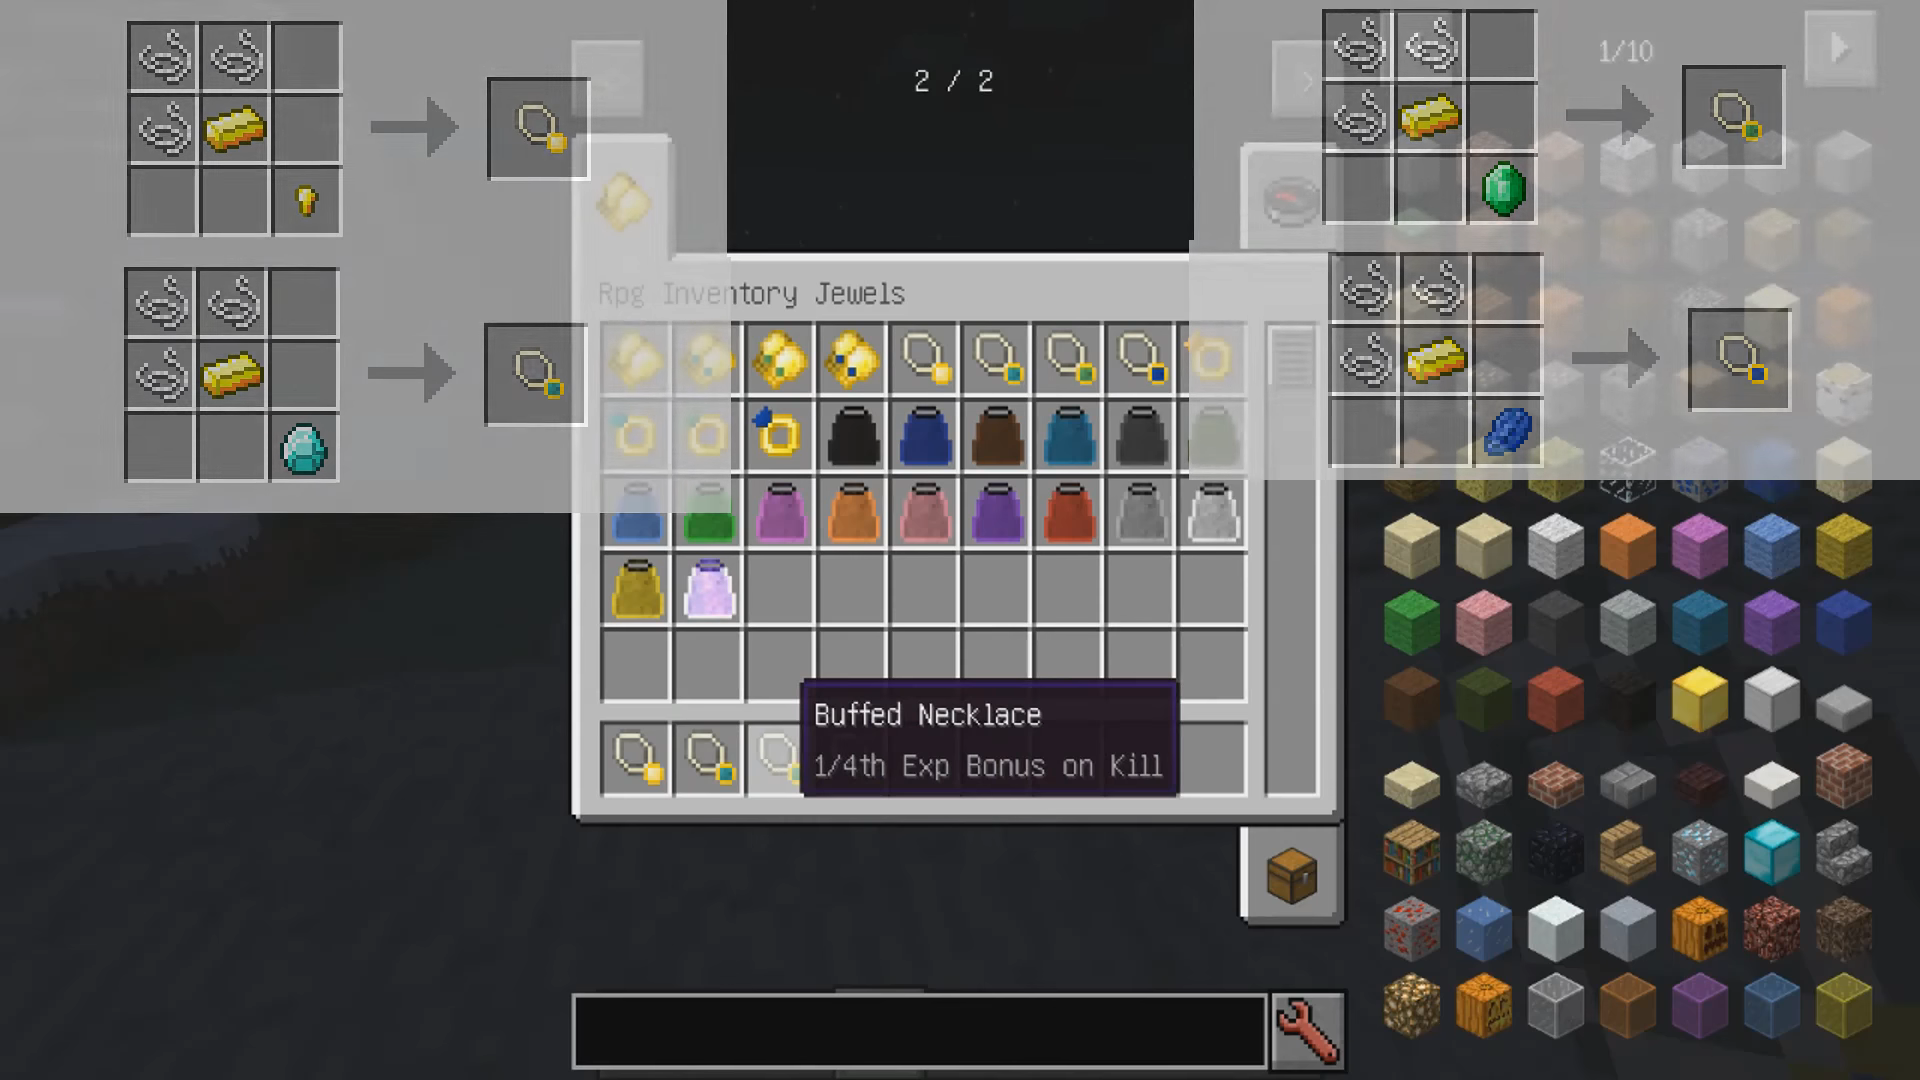 Мод «Rpg Inventory» (Прокачка игрока) - скриншот 2